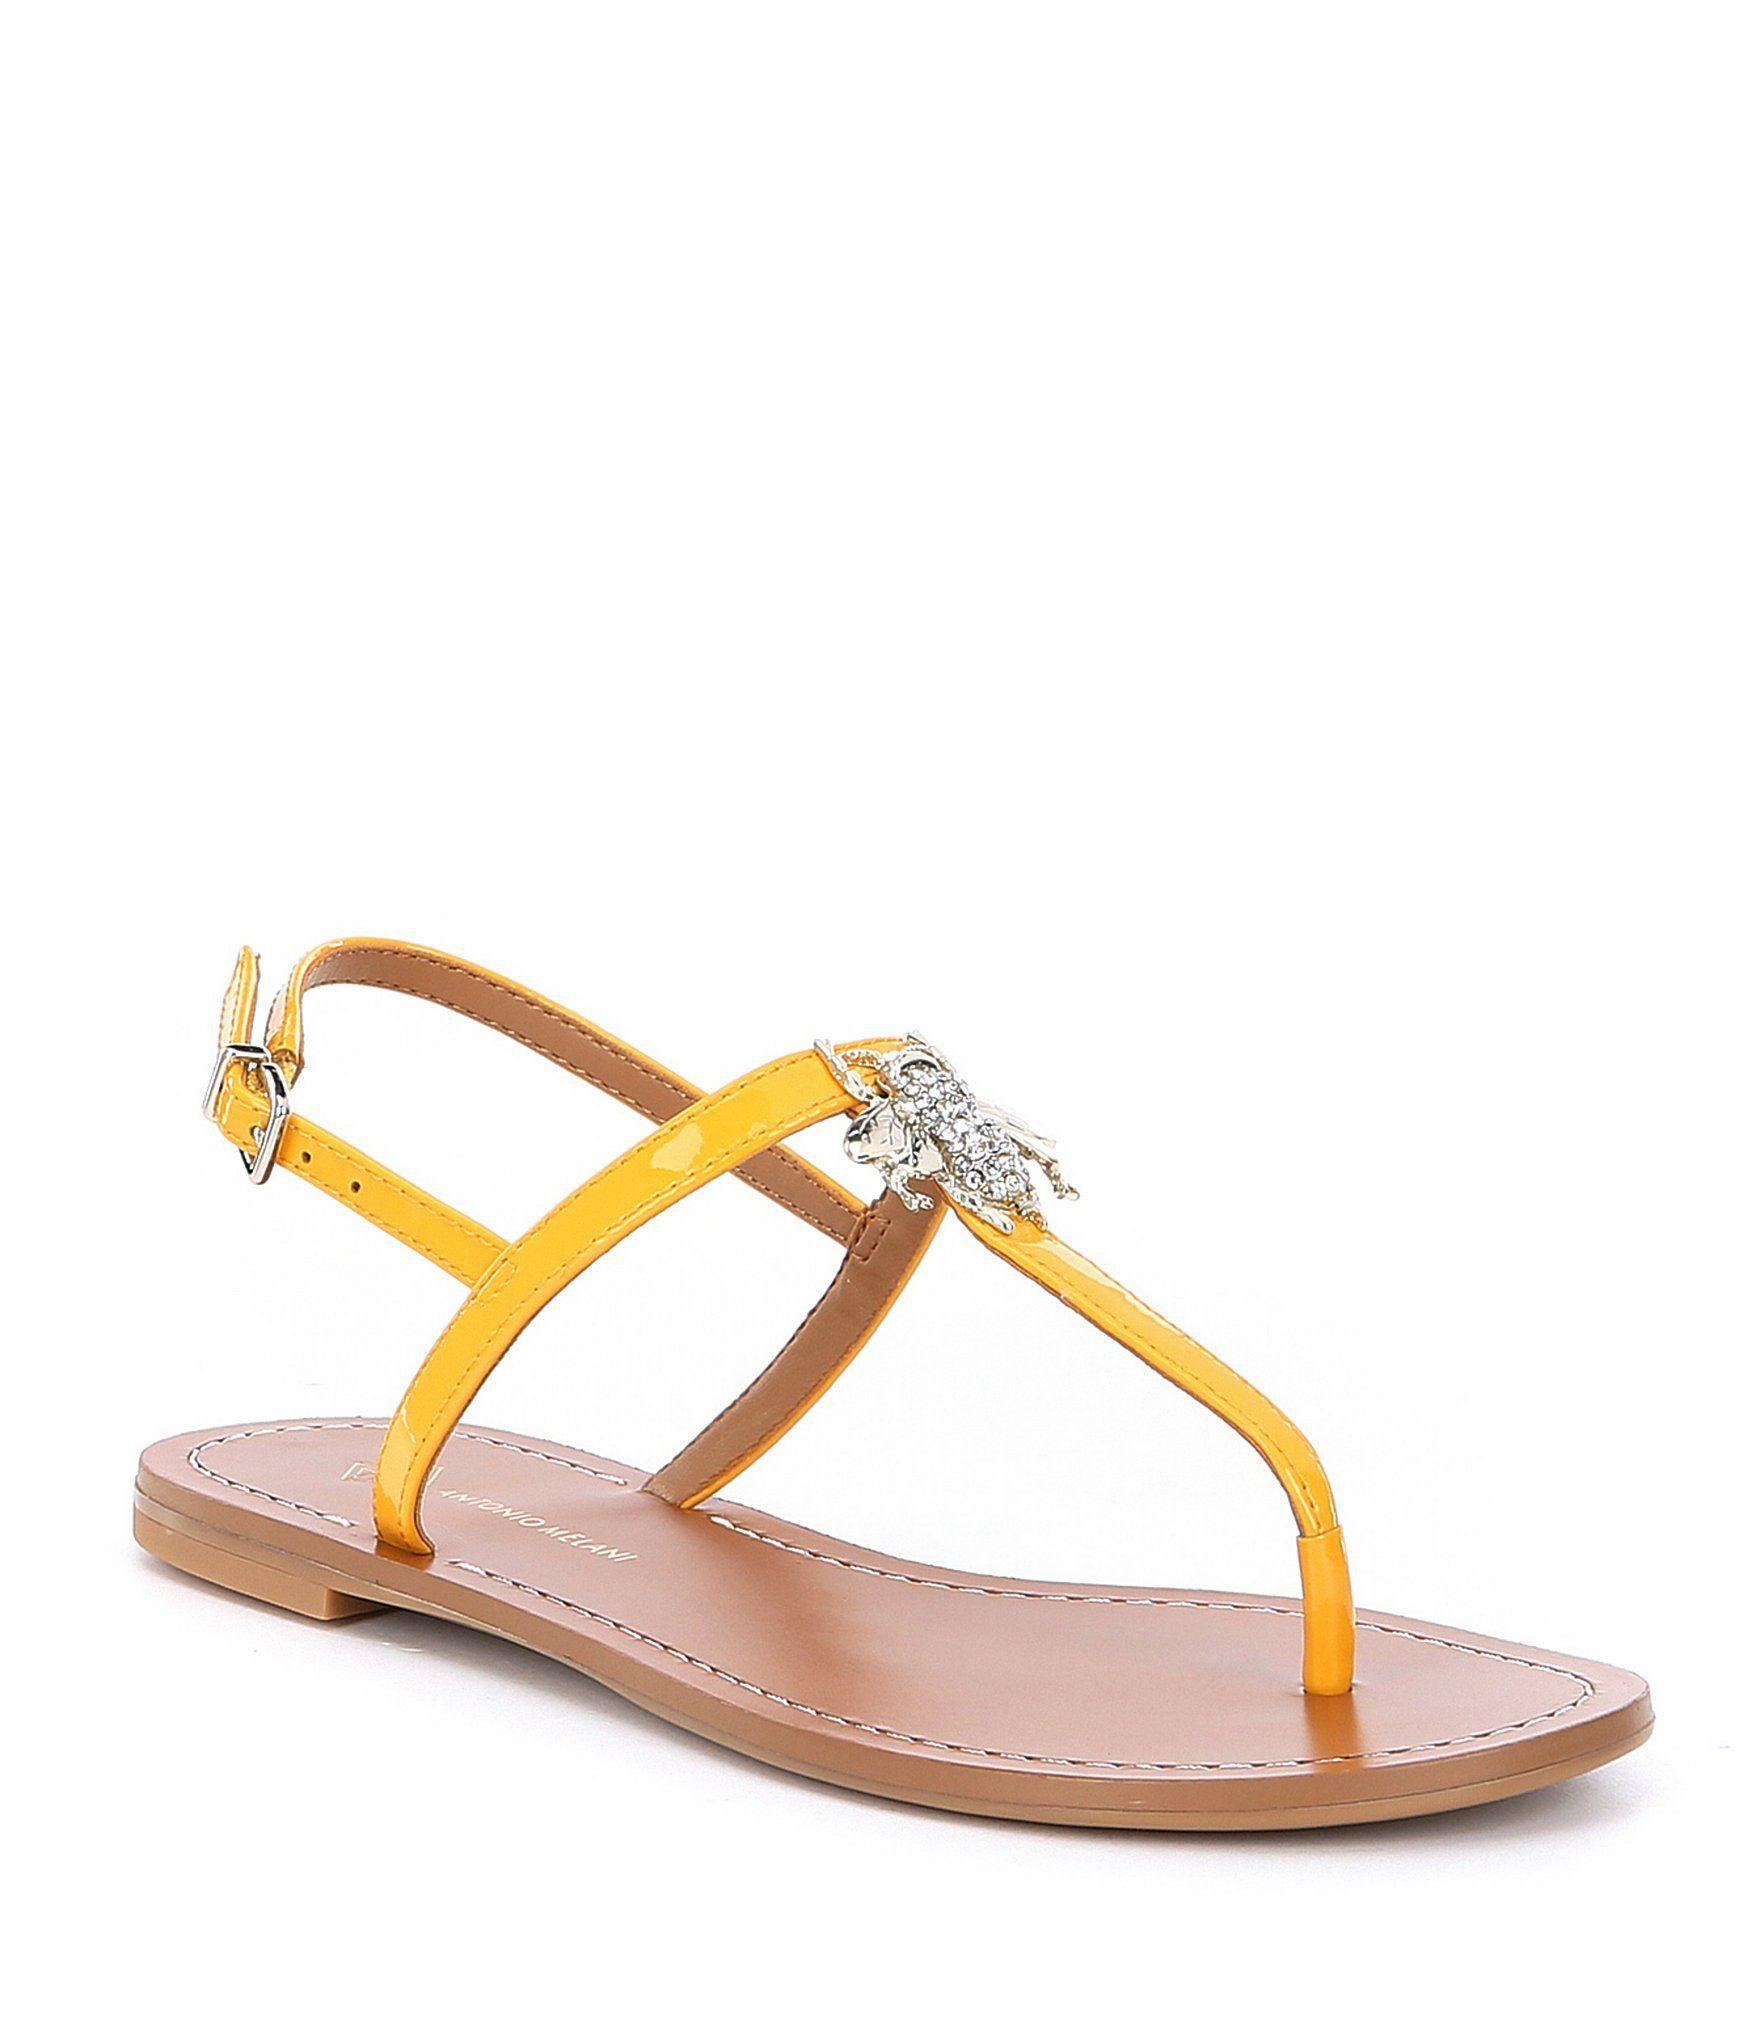 Bieah Patent Leather Jewel Bee Ornament Thong Sandals 2fk2F7w1i